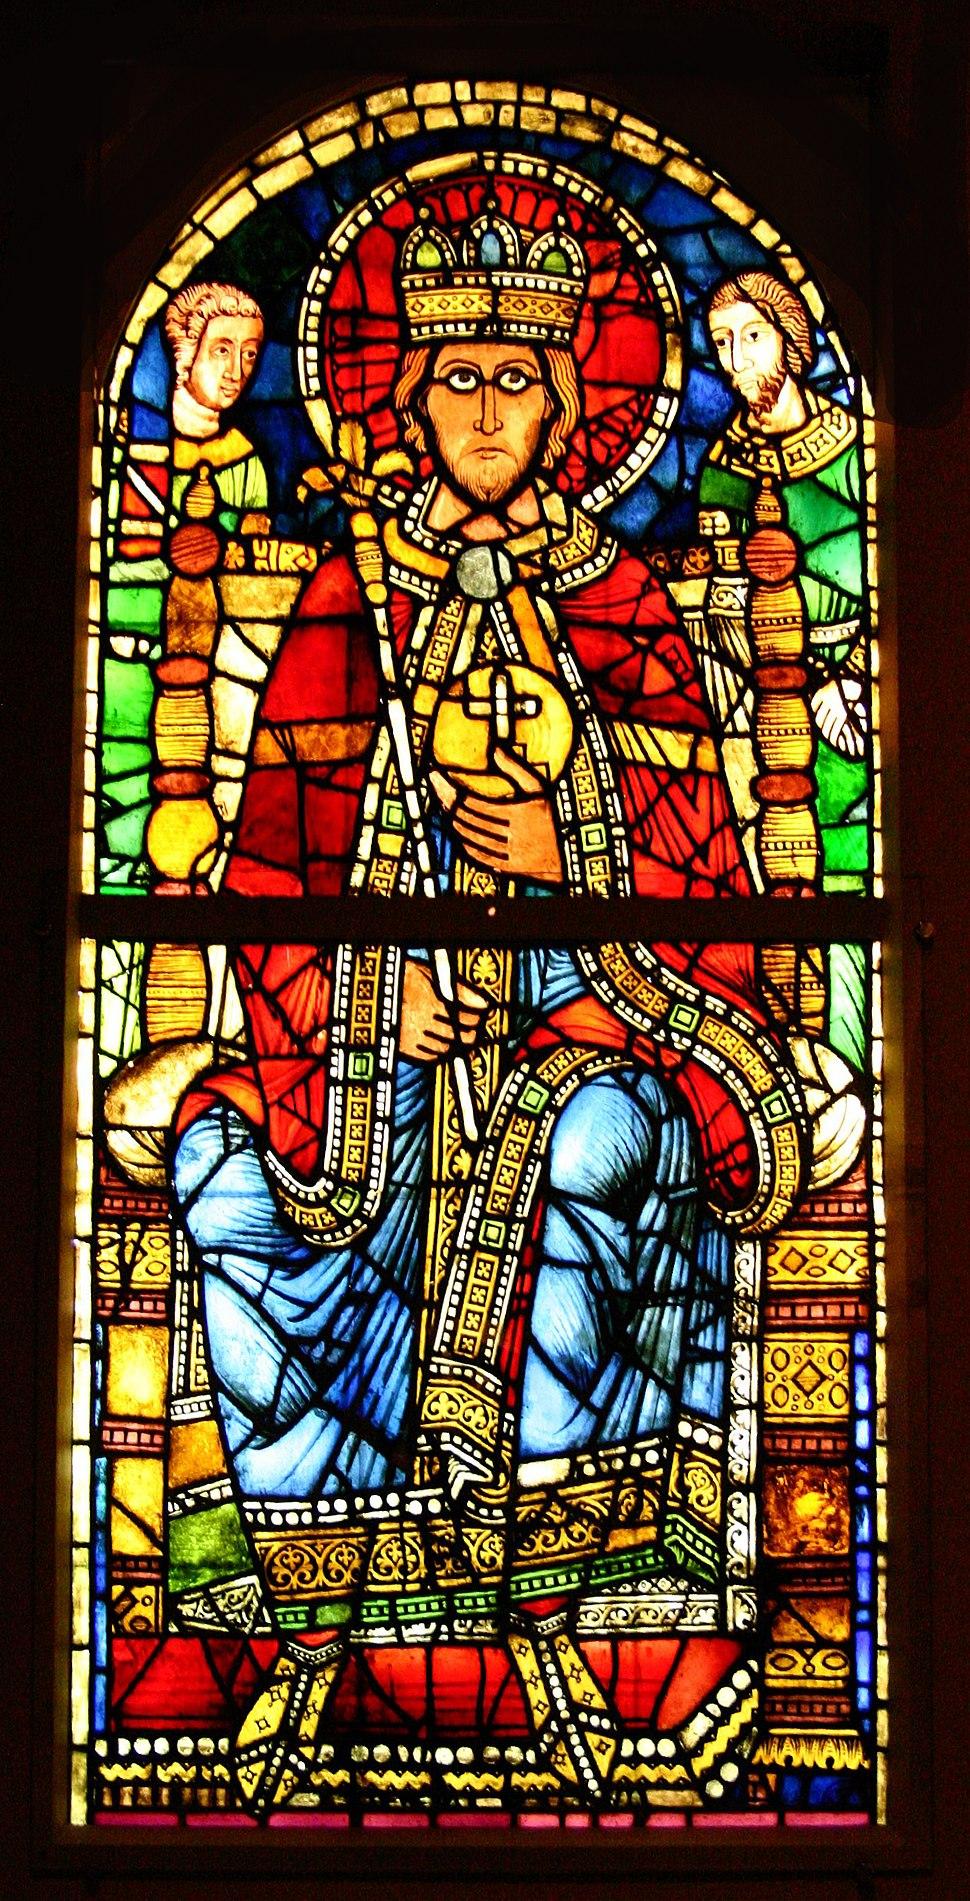 Musee-de-l-Oeuvre-Notre-Dame-Strasbourg-IMG 1465 crop